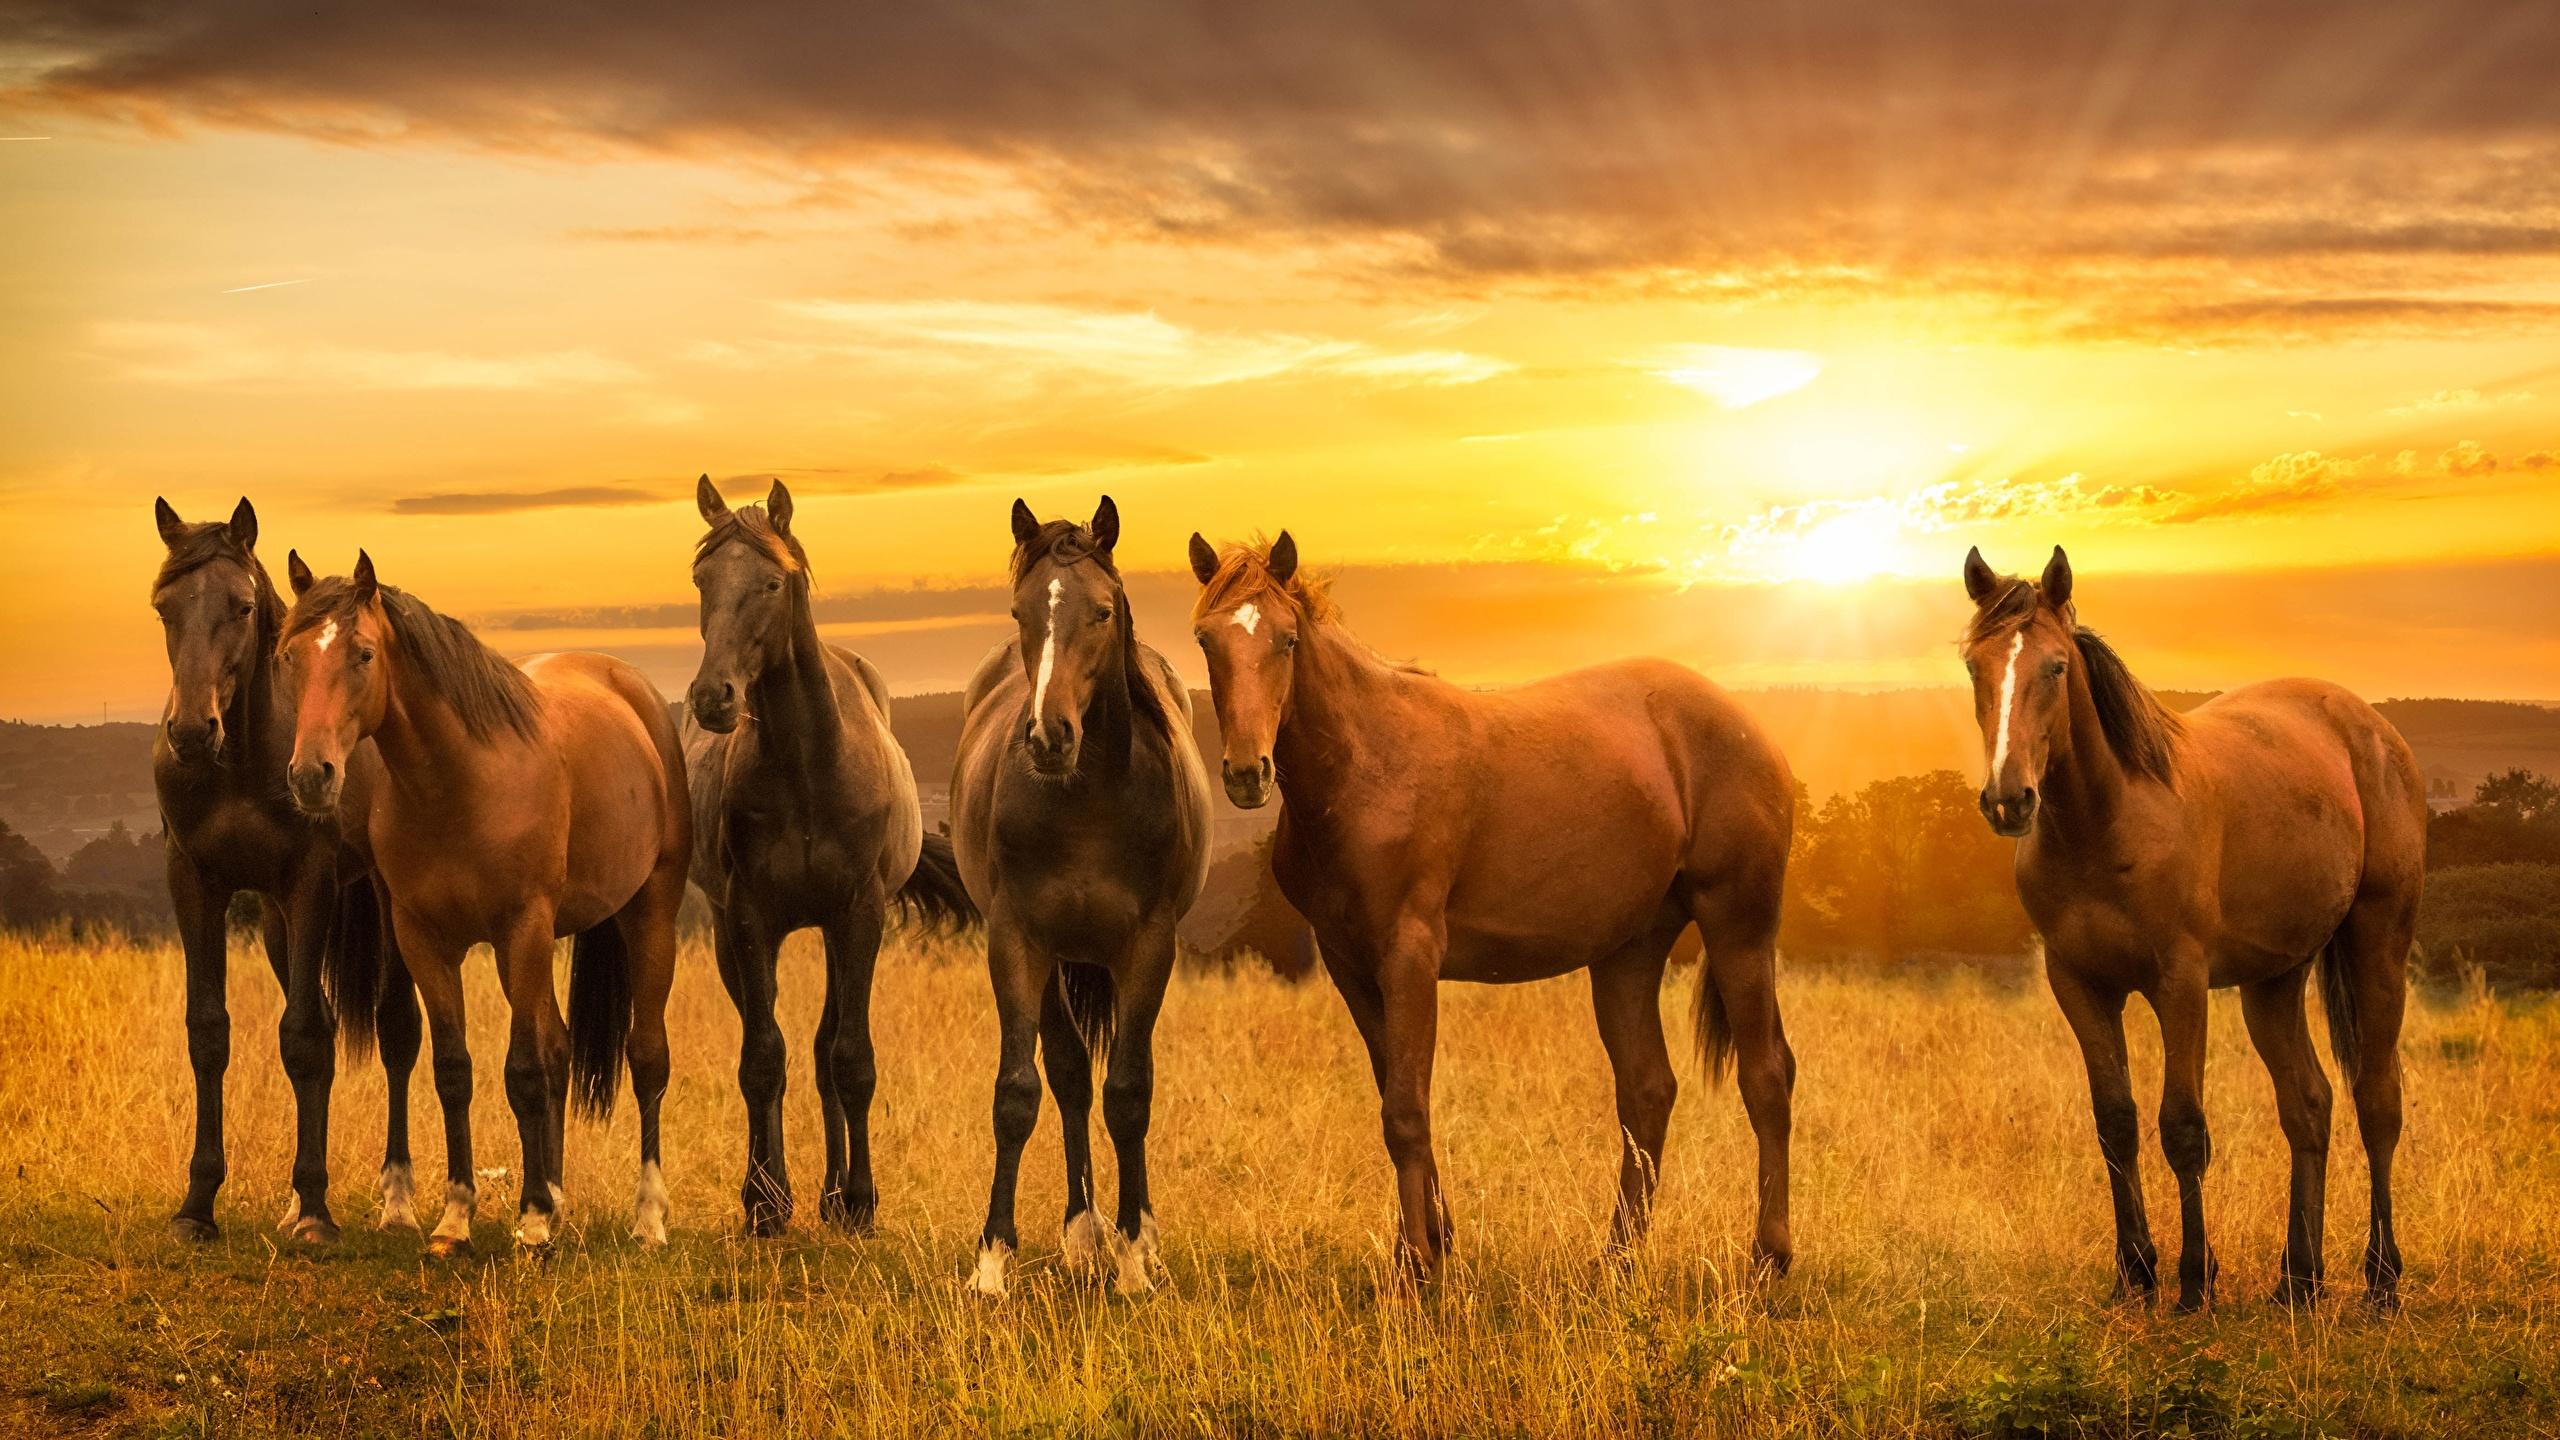 Wallpaper caballos en el atardecer